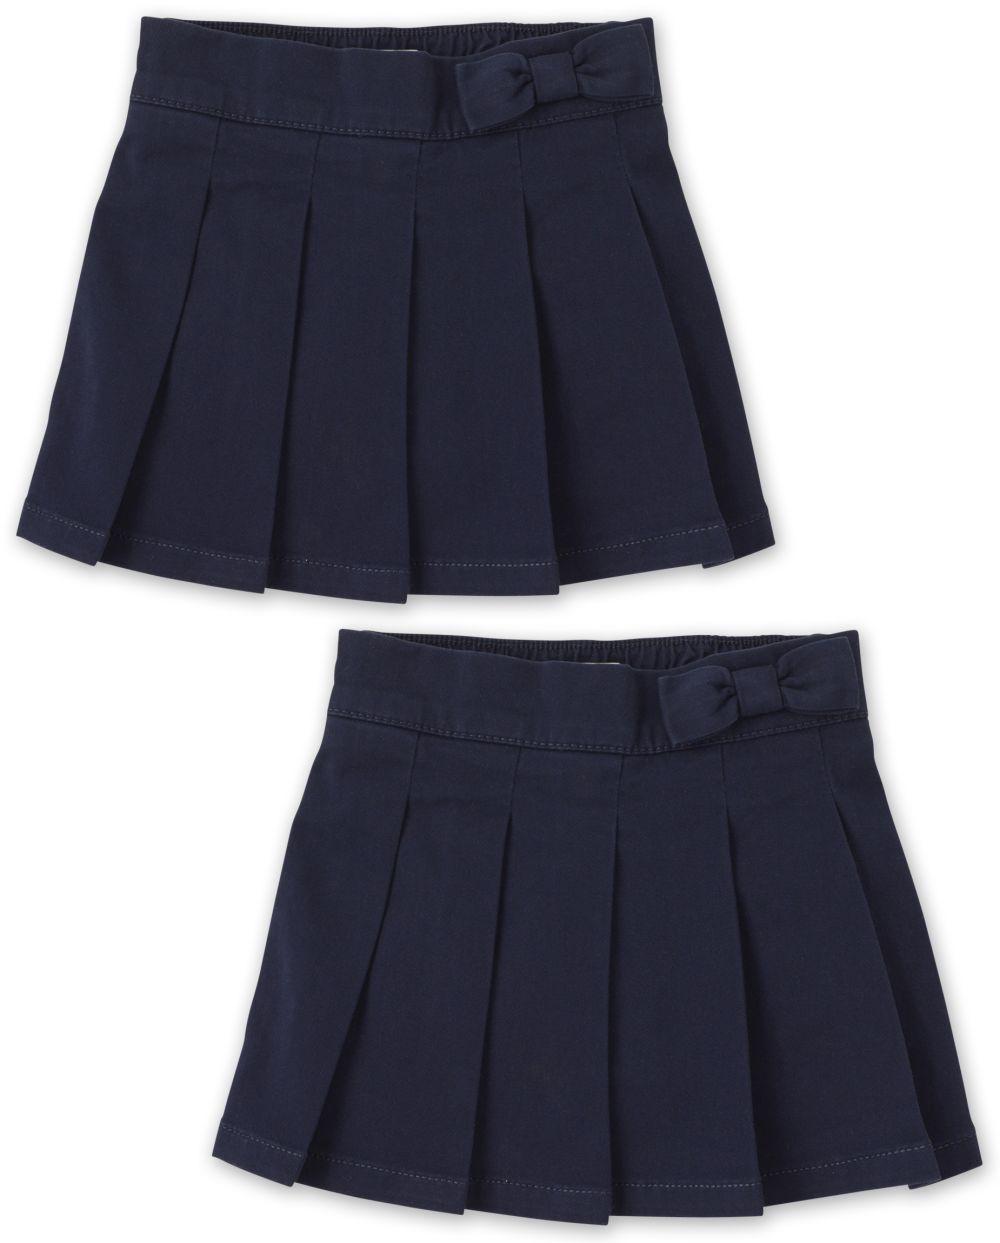 Toddler Girls Uniform Pleated Skort 2-Pack